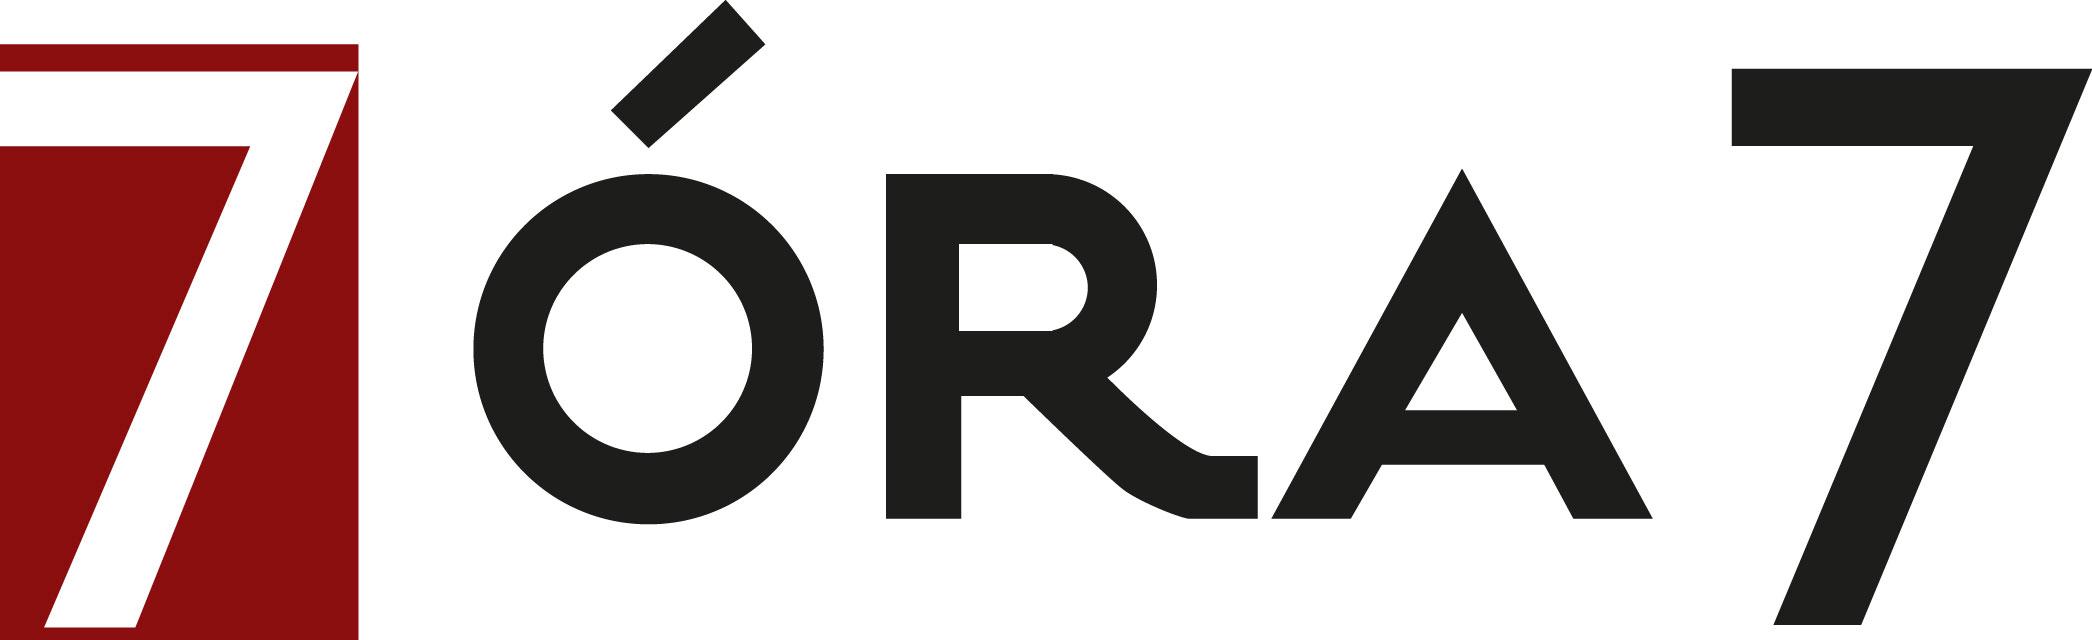 7ora7_logo.jpg